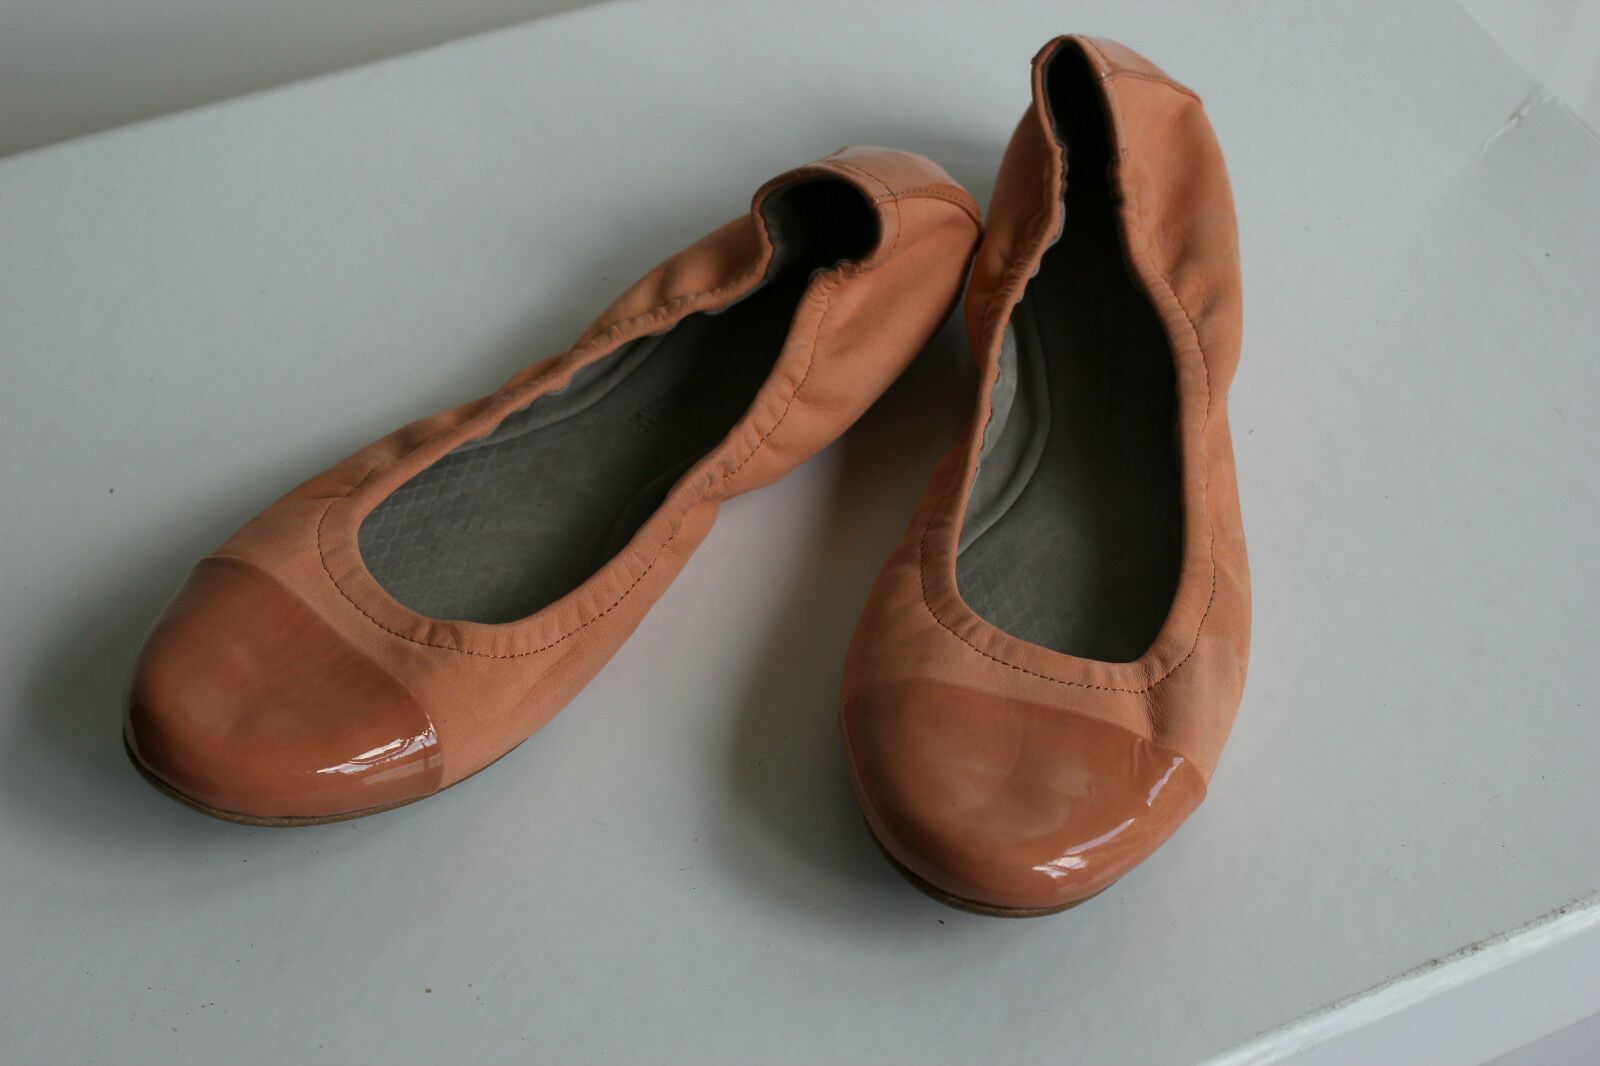 KENNEL&SCHMENGER Gr. Traum Hellrosa Leder Ballerinas, Gr. KENNEL&SCHMENGER 39/UK6, Top Zustand 3ab477